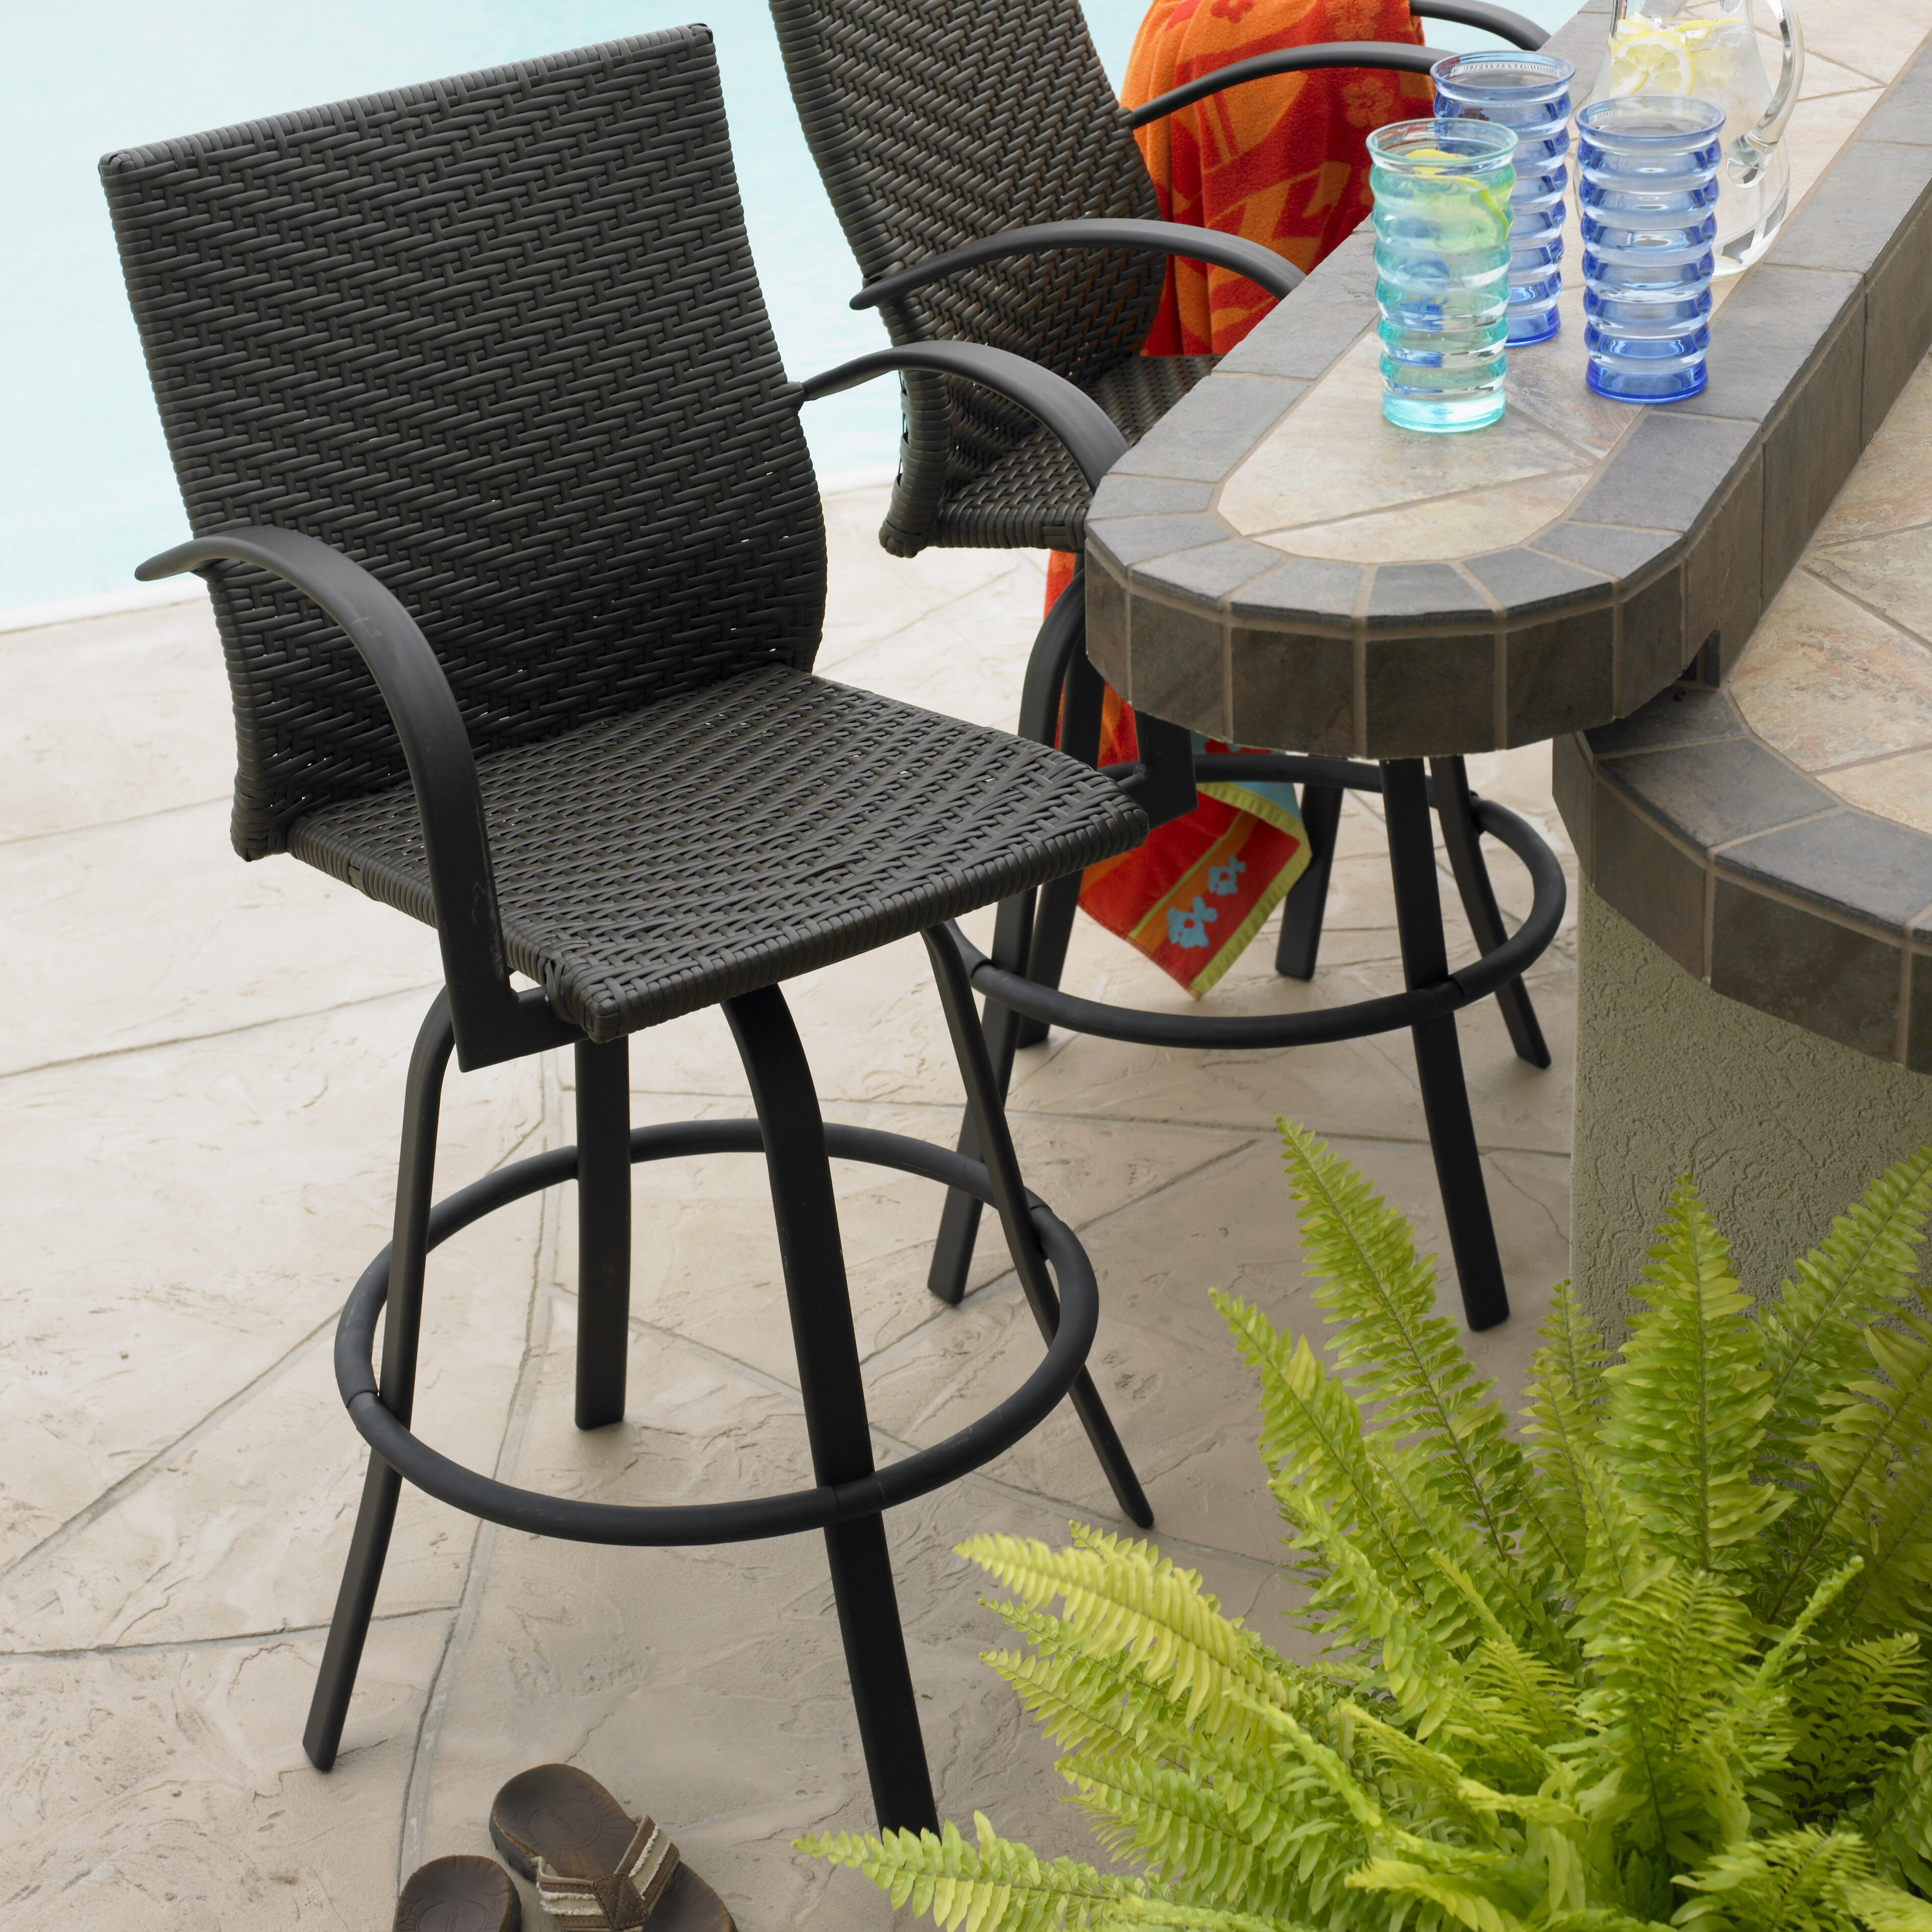 Bay Isle Home Antigua 29quot Bar Stool amp Reviews Wayfair : Naples2BSwivel2BBarstool2BSet from www.wayfair.com size 3784 x 3784 jpeg 2583kB